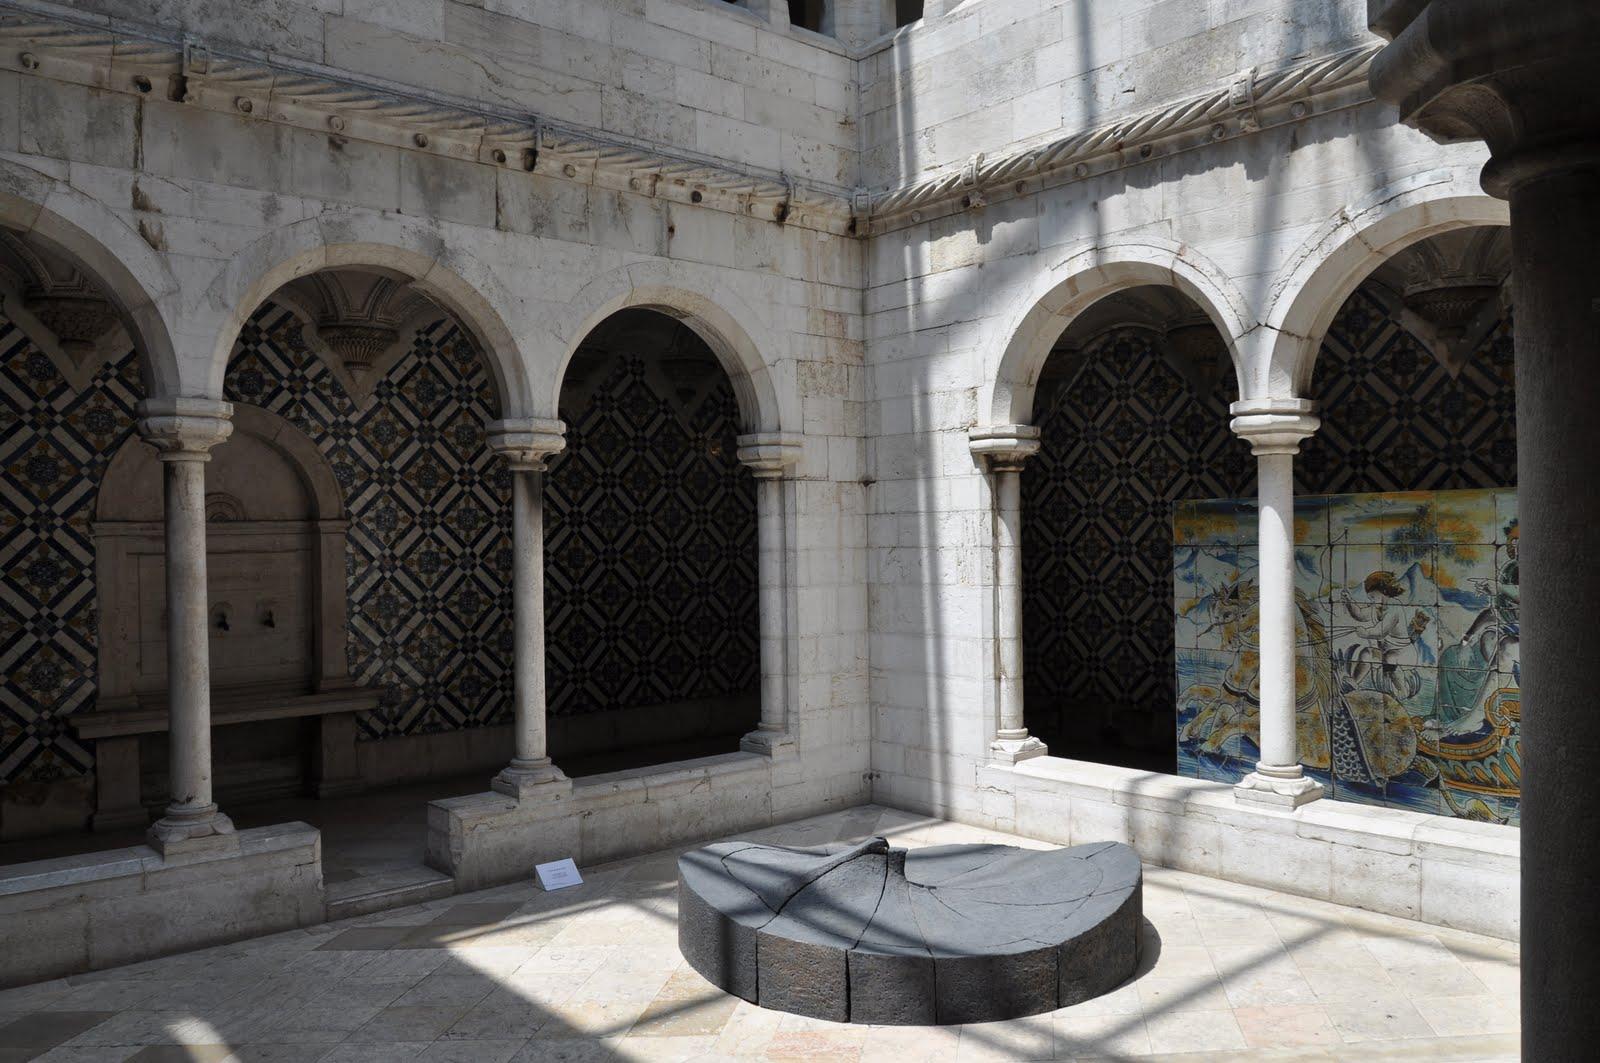 Tile Museum Portugal : Iolanda andrade the national tile museum lisbon